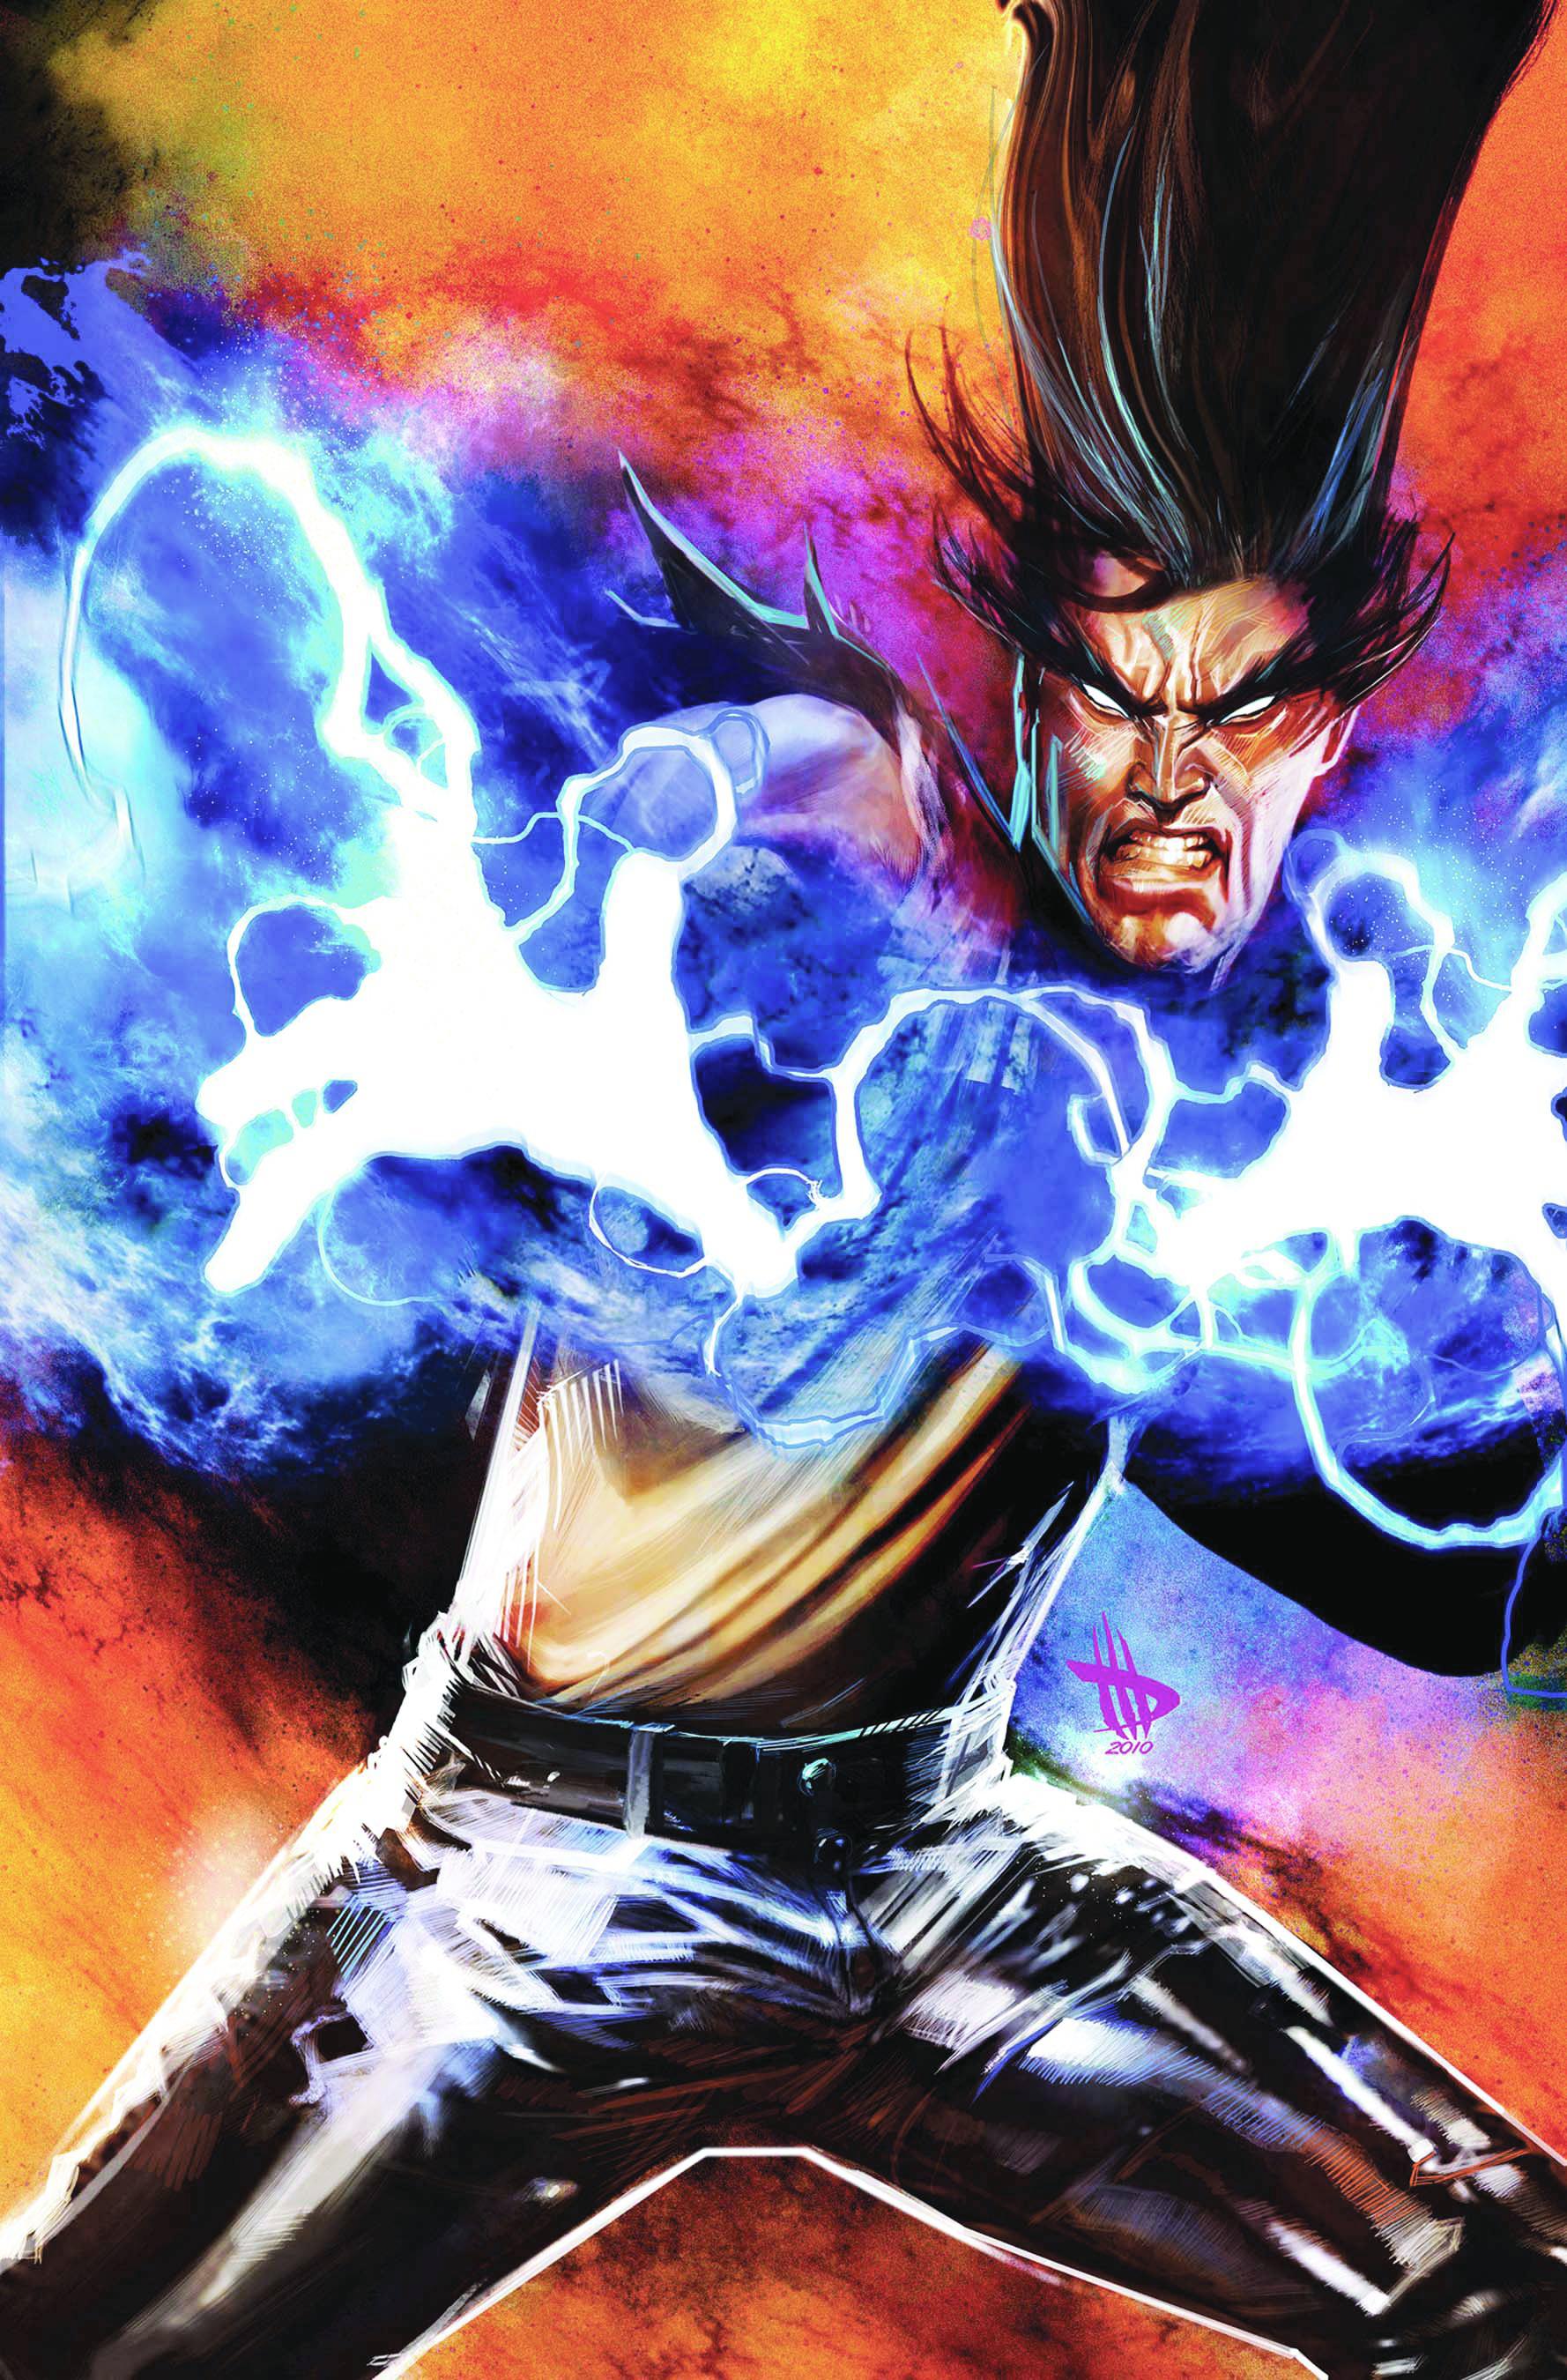 Marvel deadpools sick fantasies classified i e